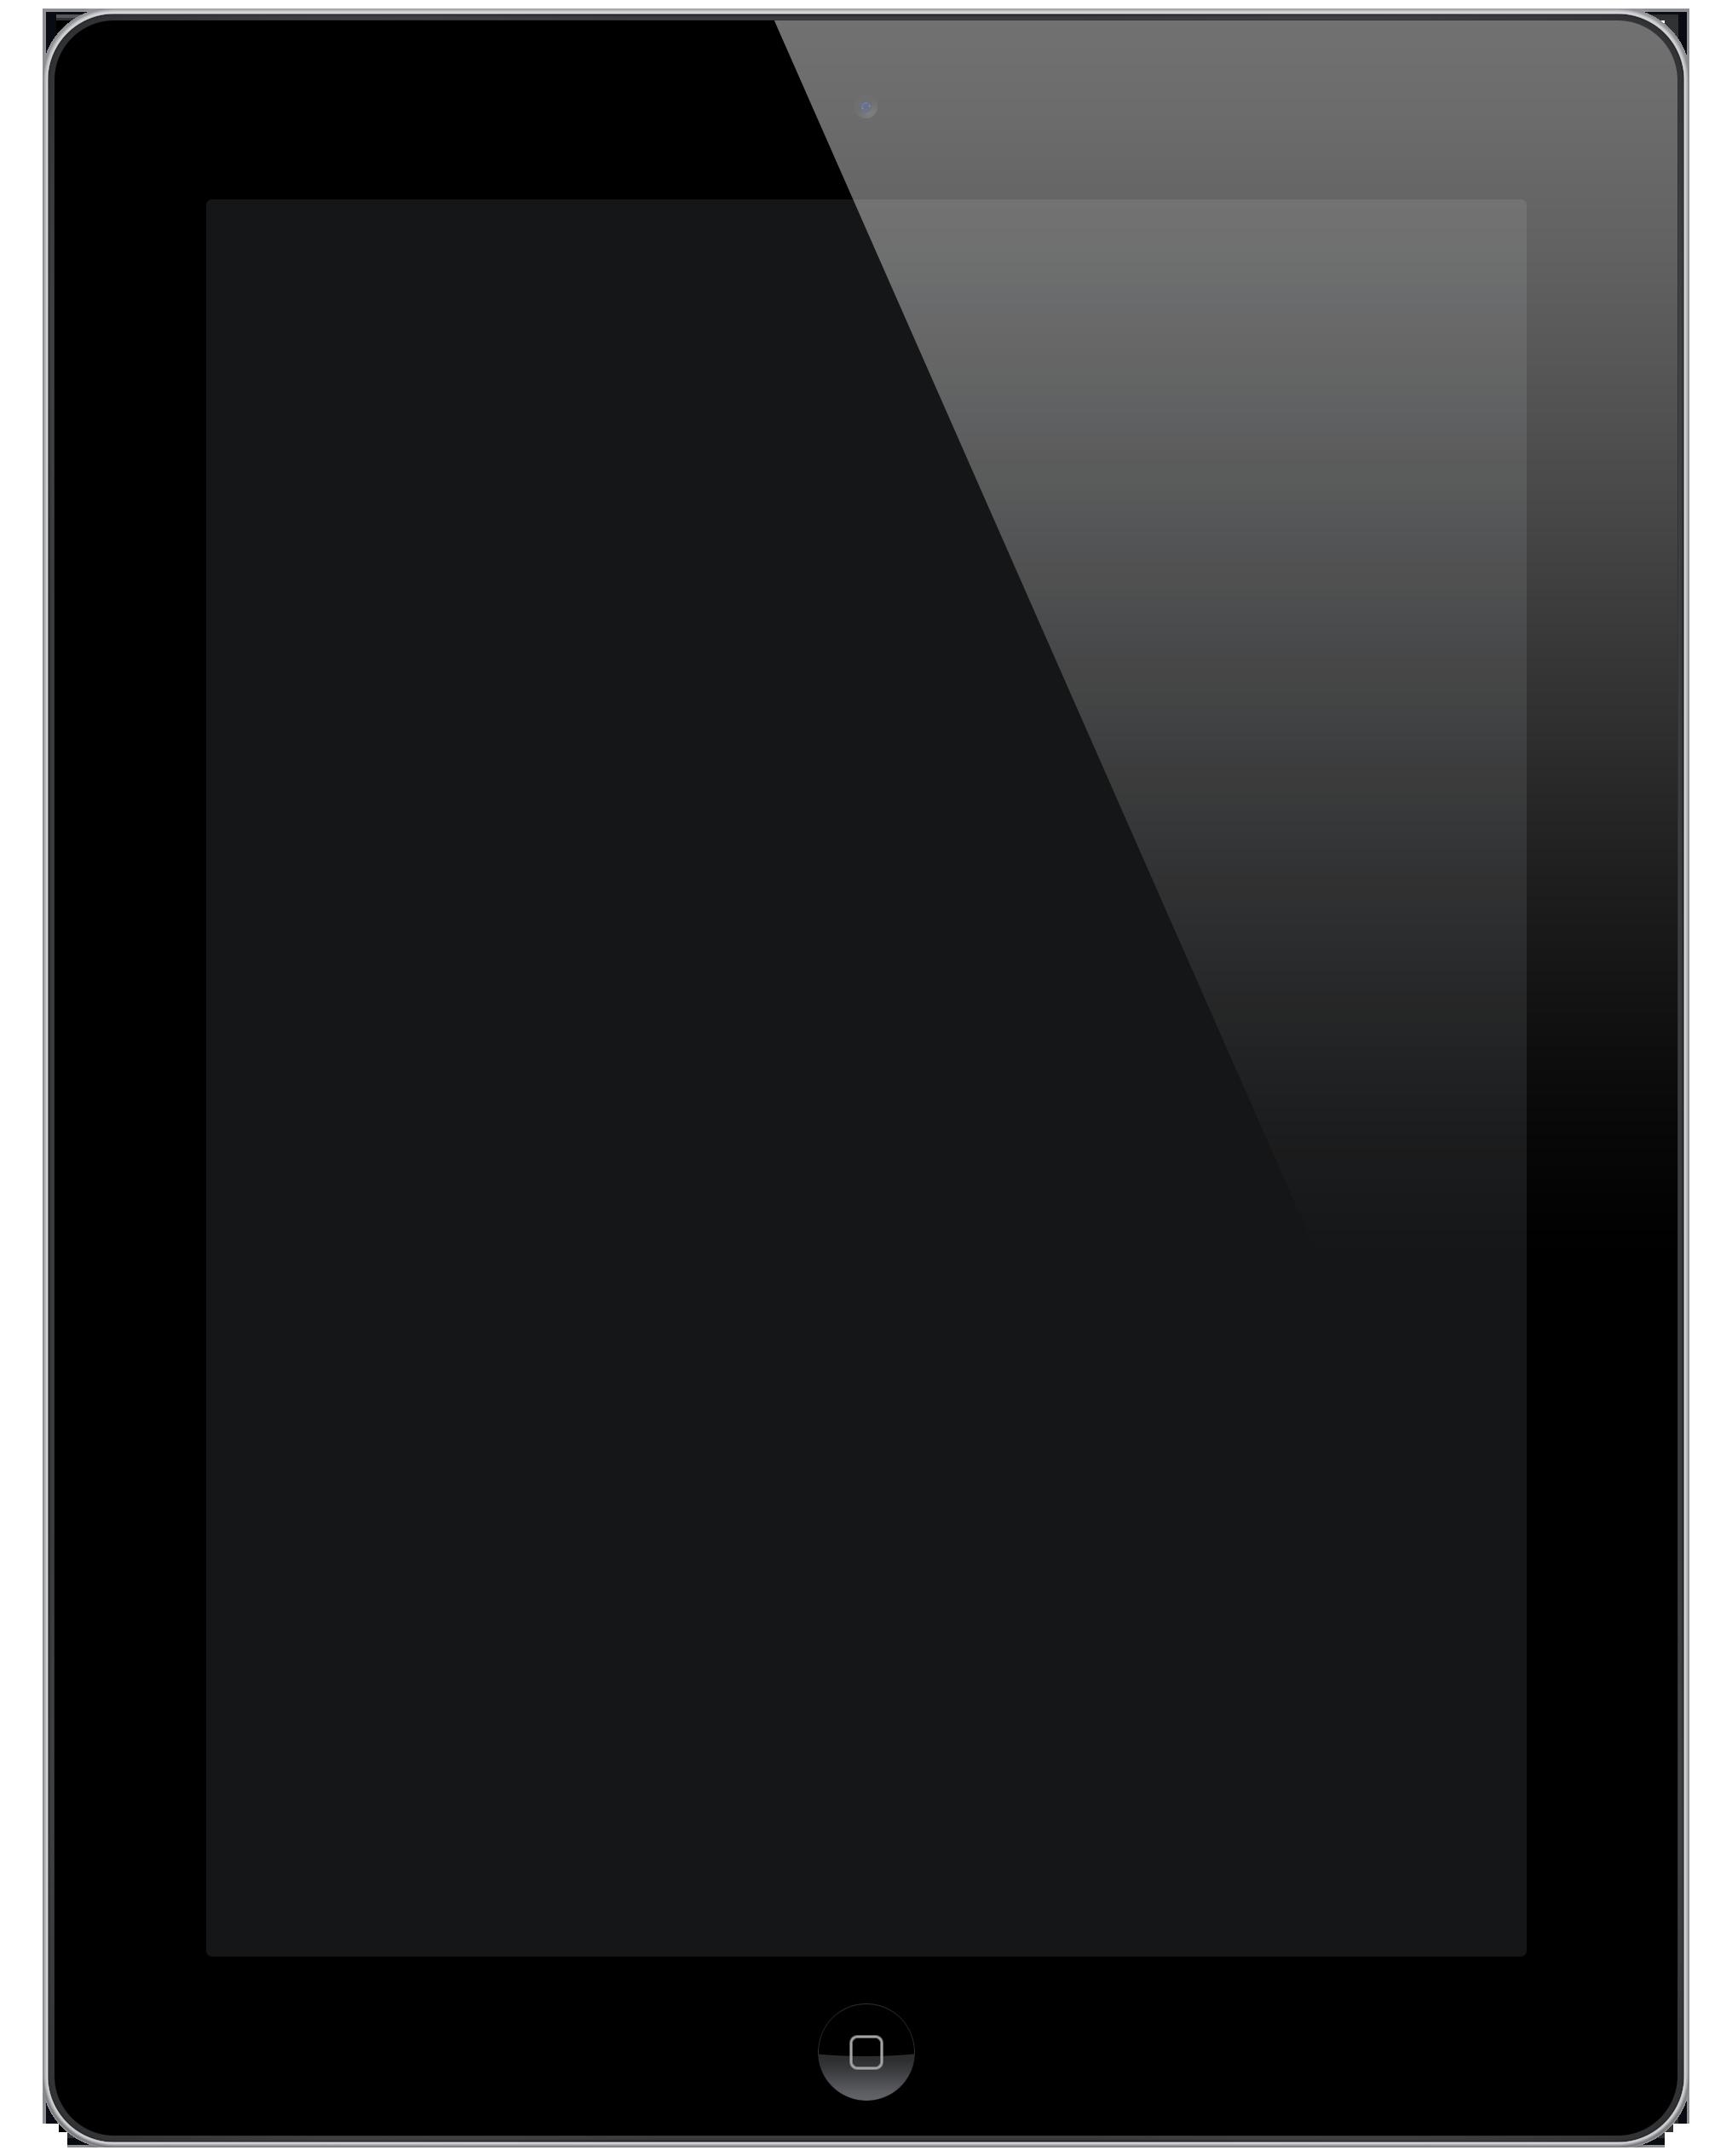 Ipad PNG - 72716